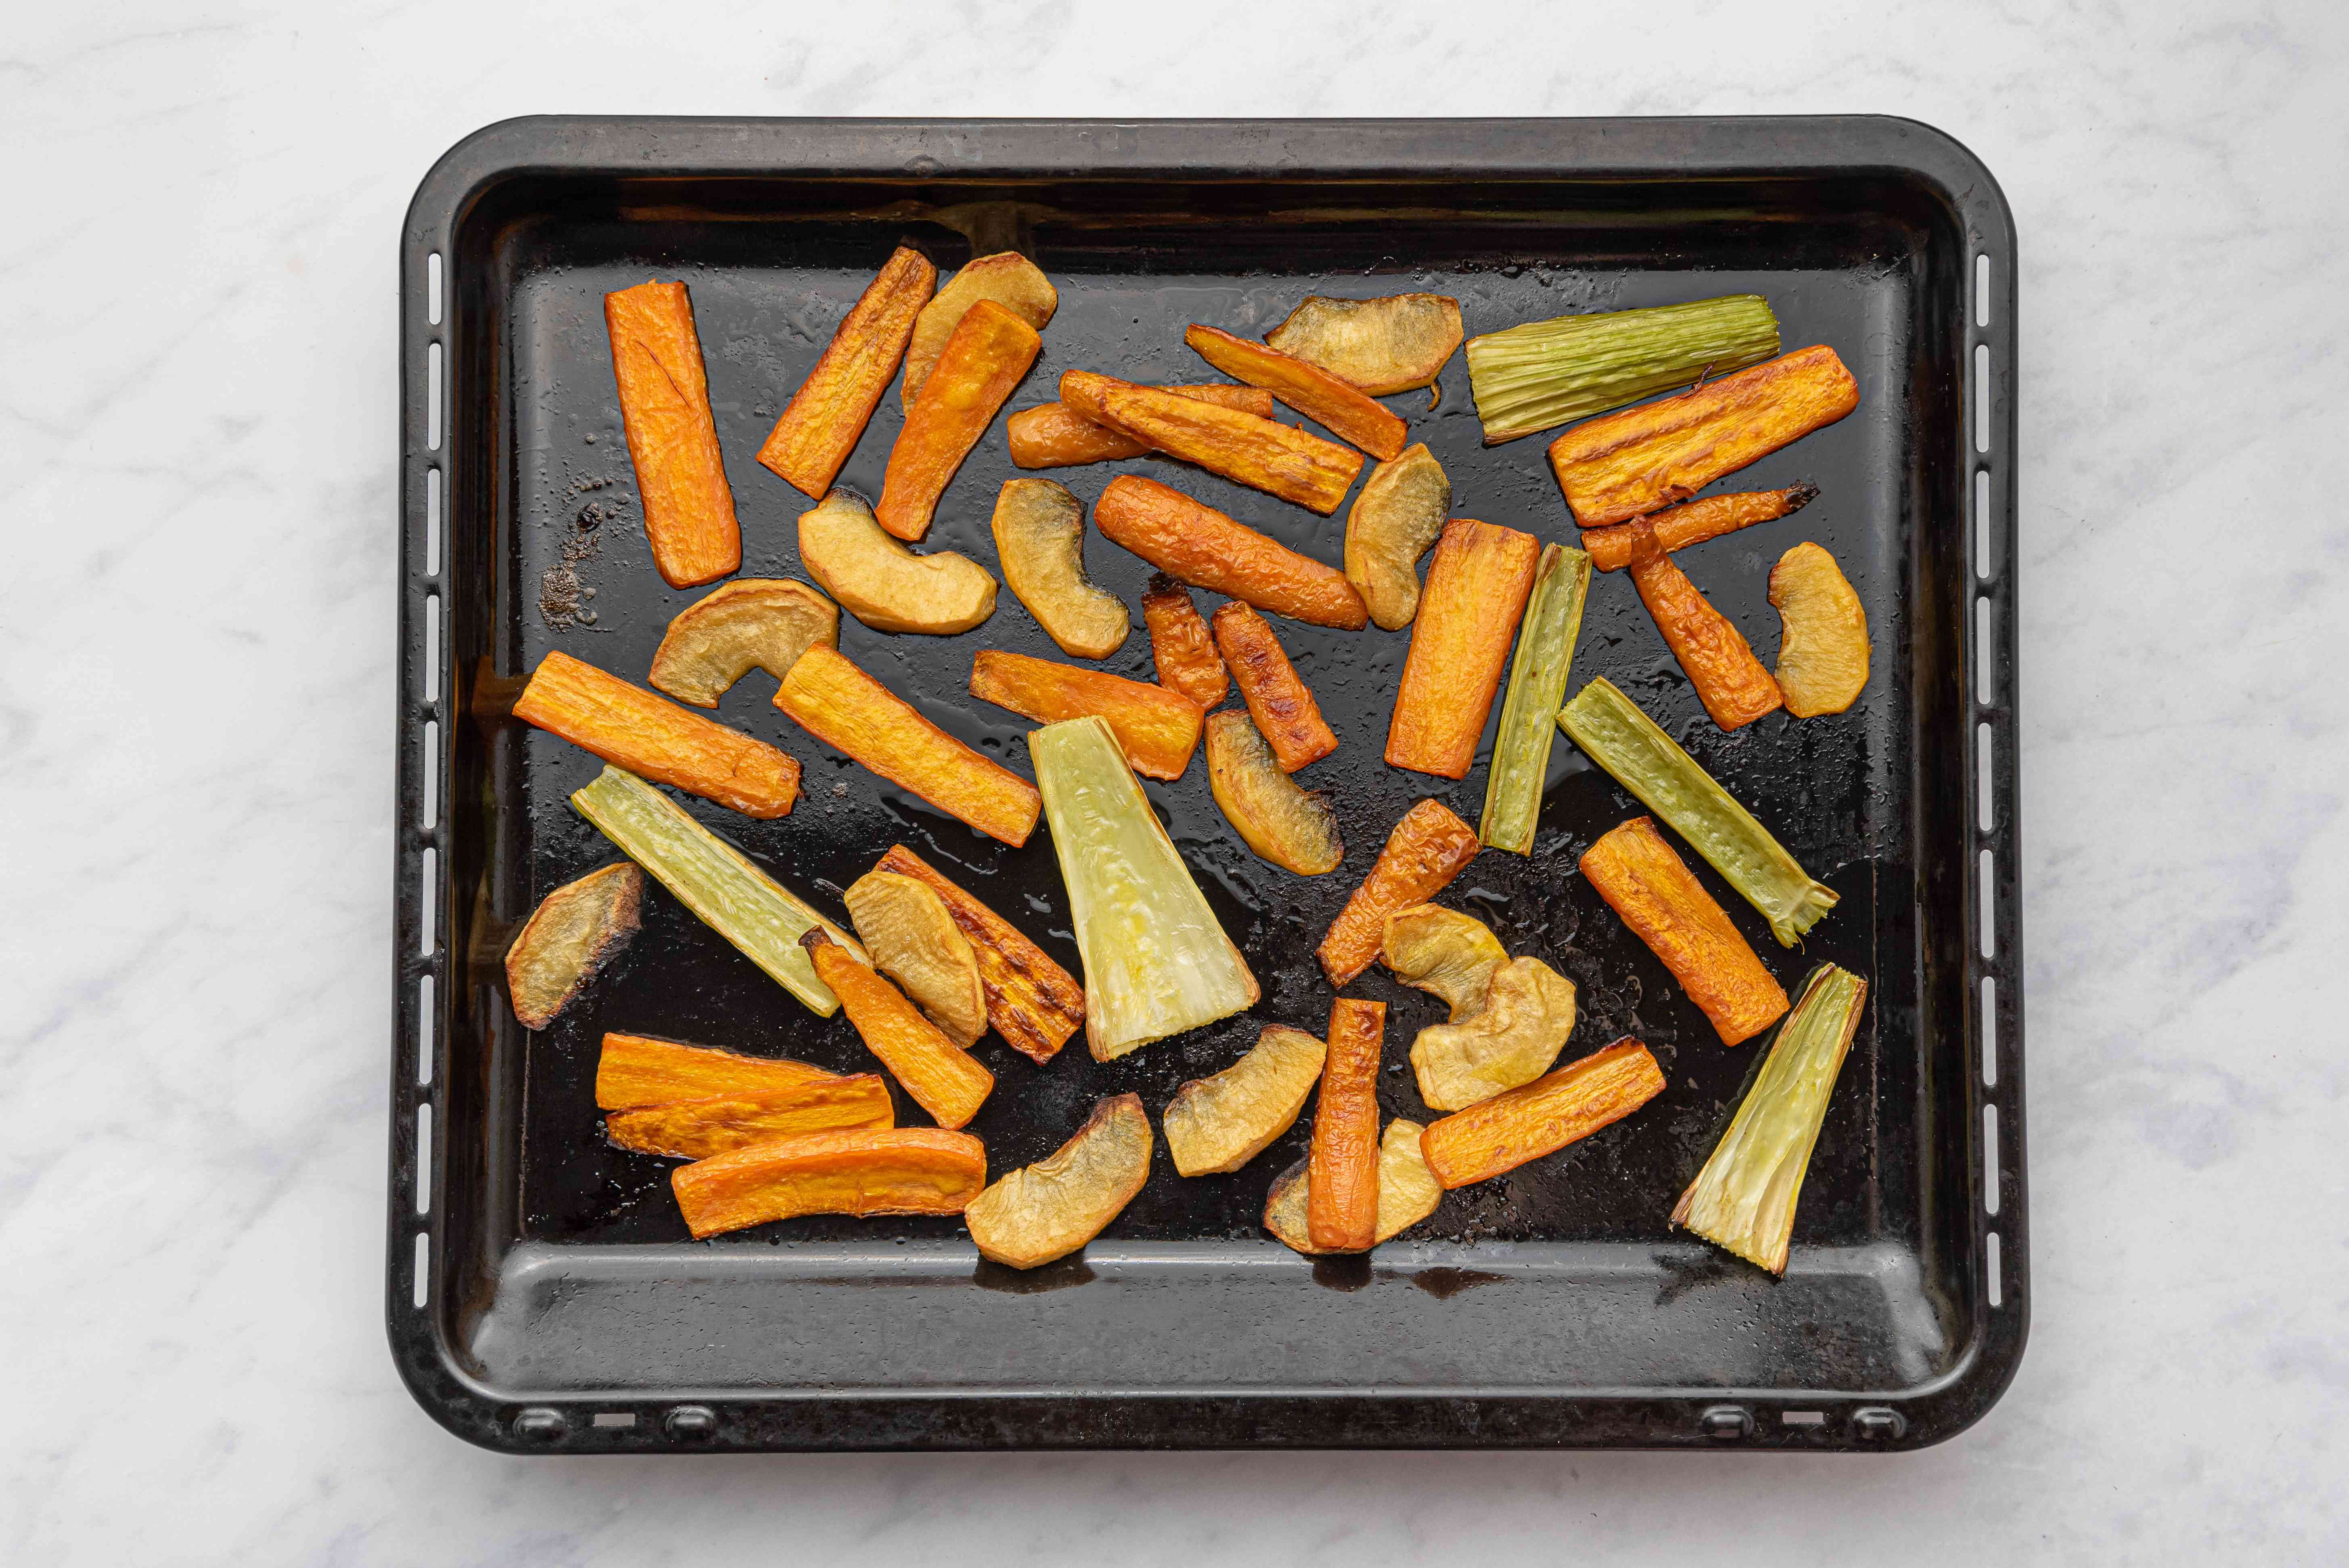 Roasted vegetables on a baking sheet